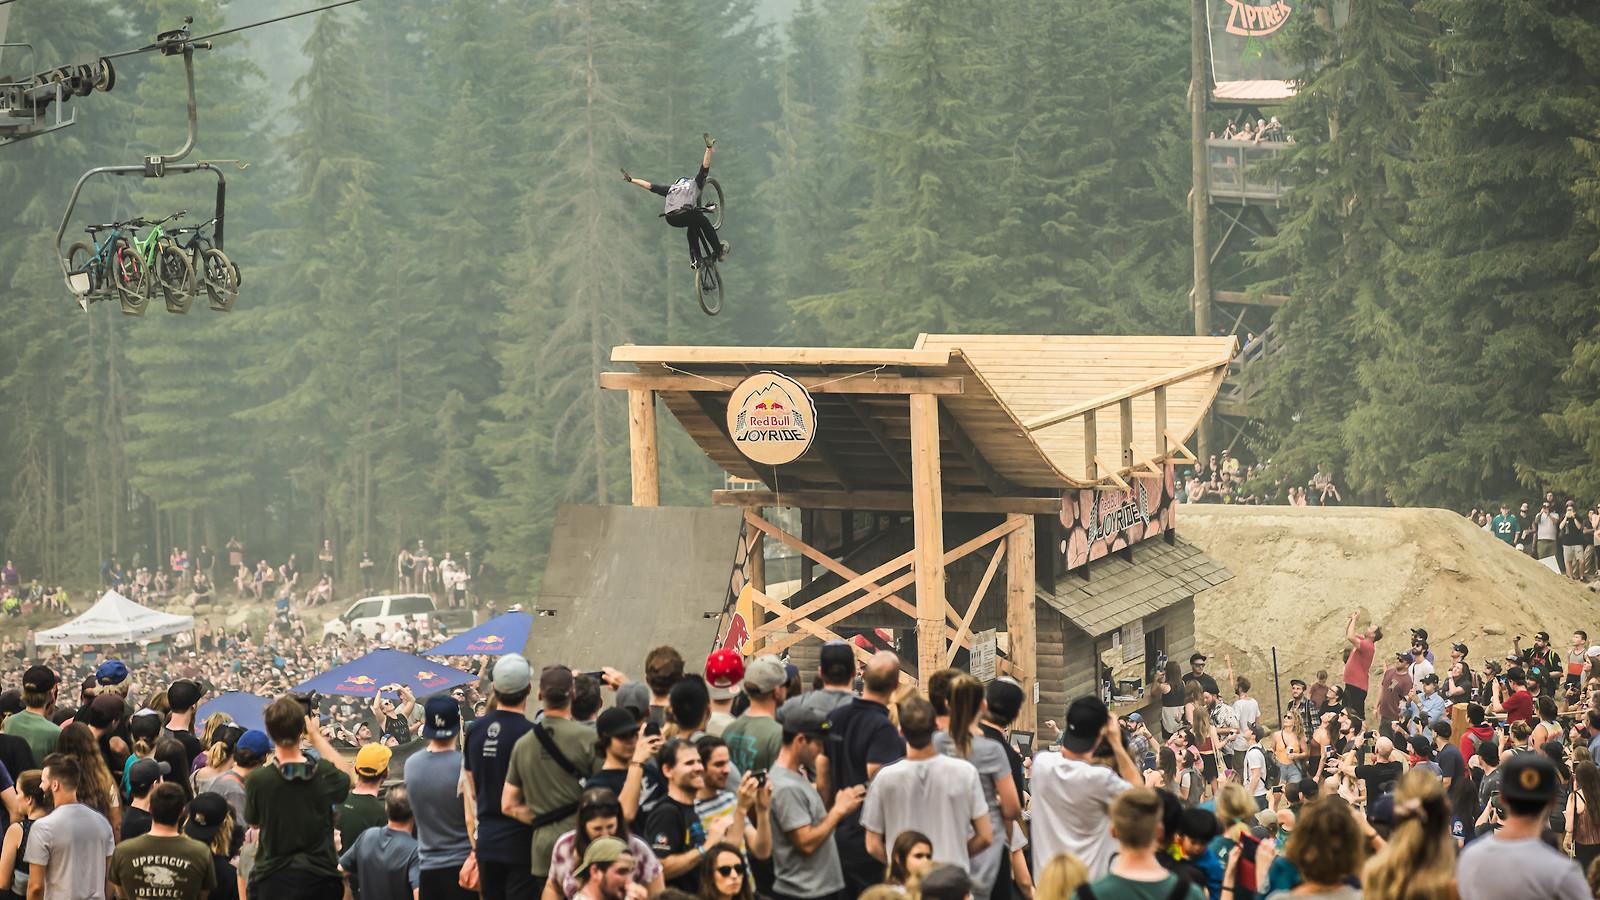 32139277757 d65dbda132 o - phunkt.com - Mountain Biking Pictures - Vital MTB